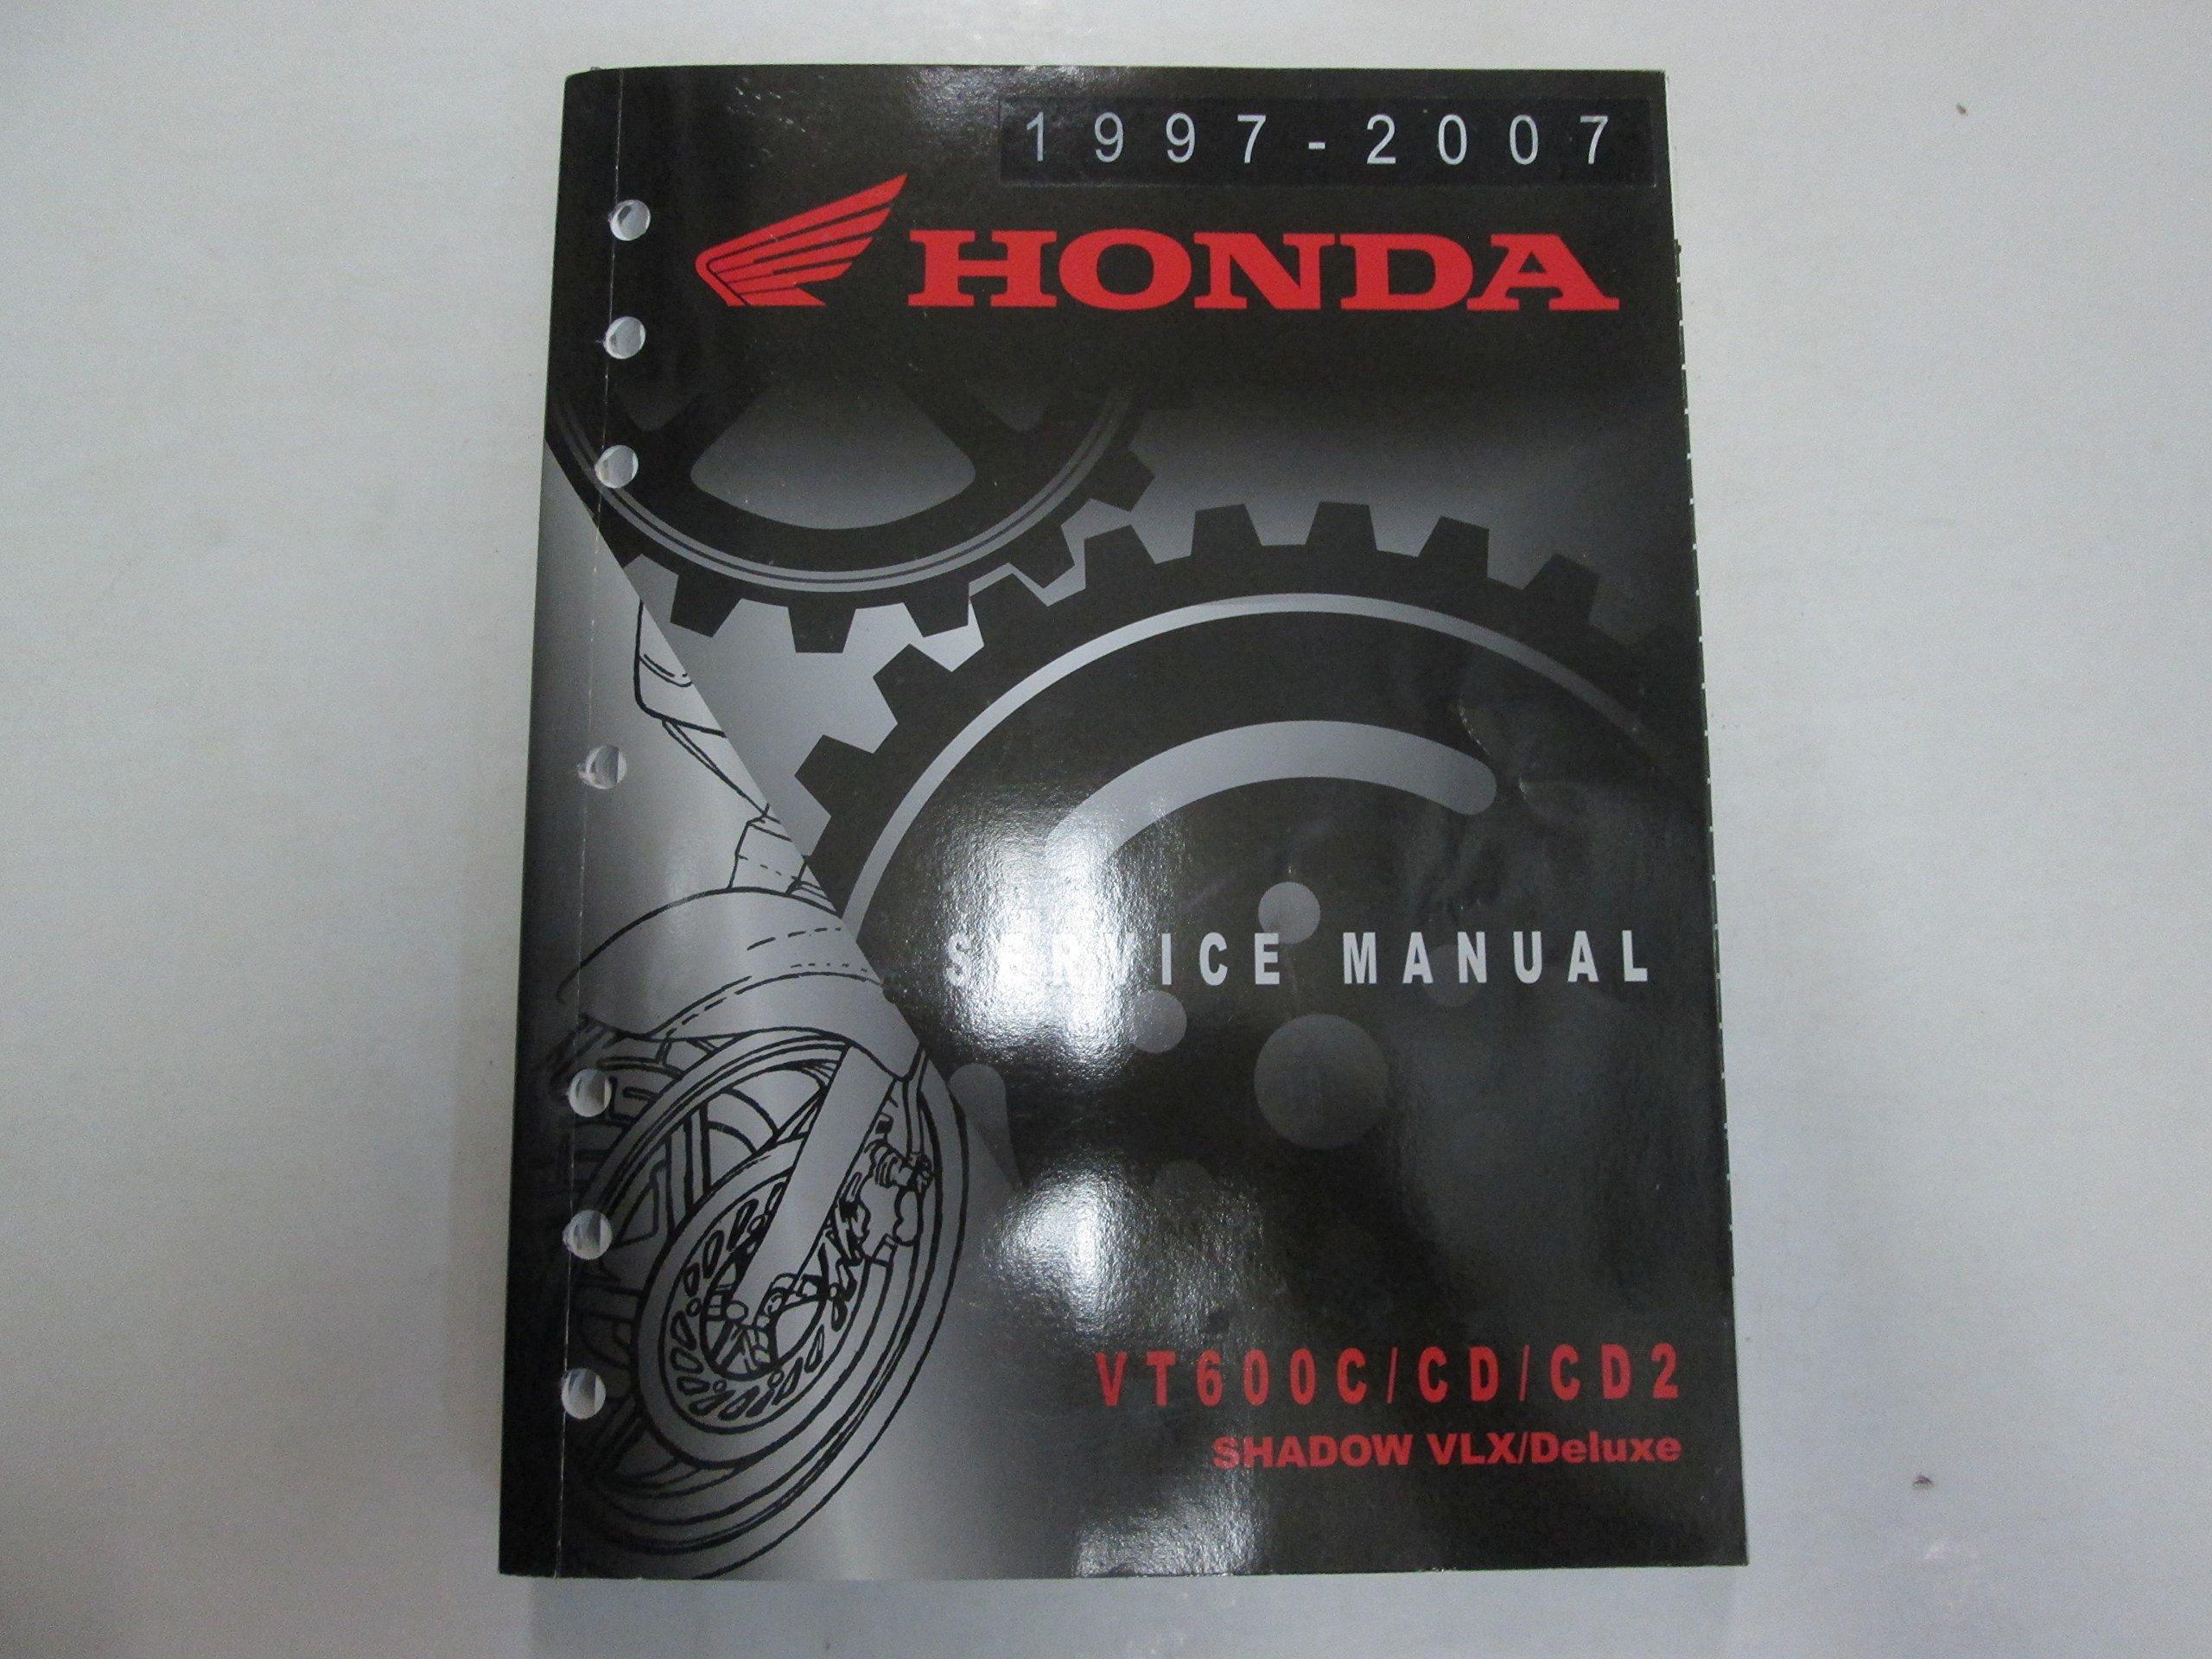 1997 2007 Honda Vt600ccdcd2 Shadow Vlx Deluxe Service Repair